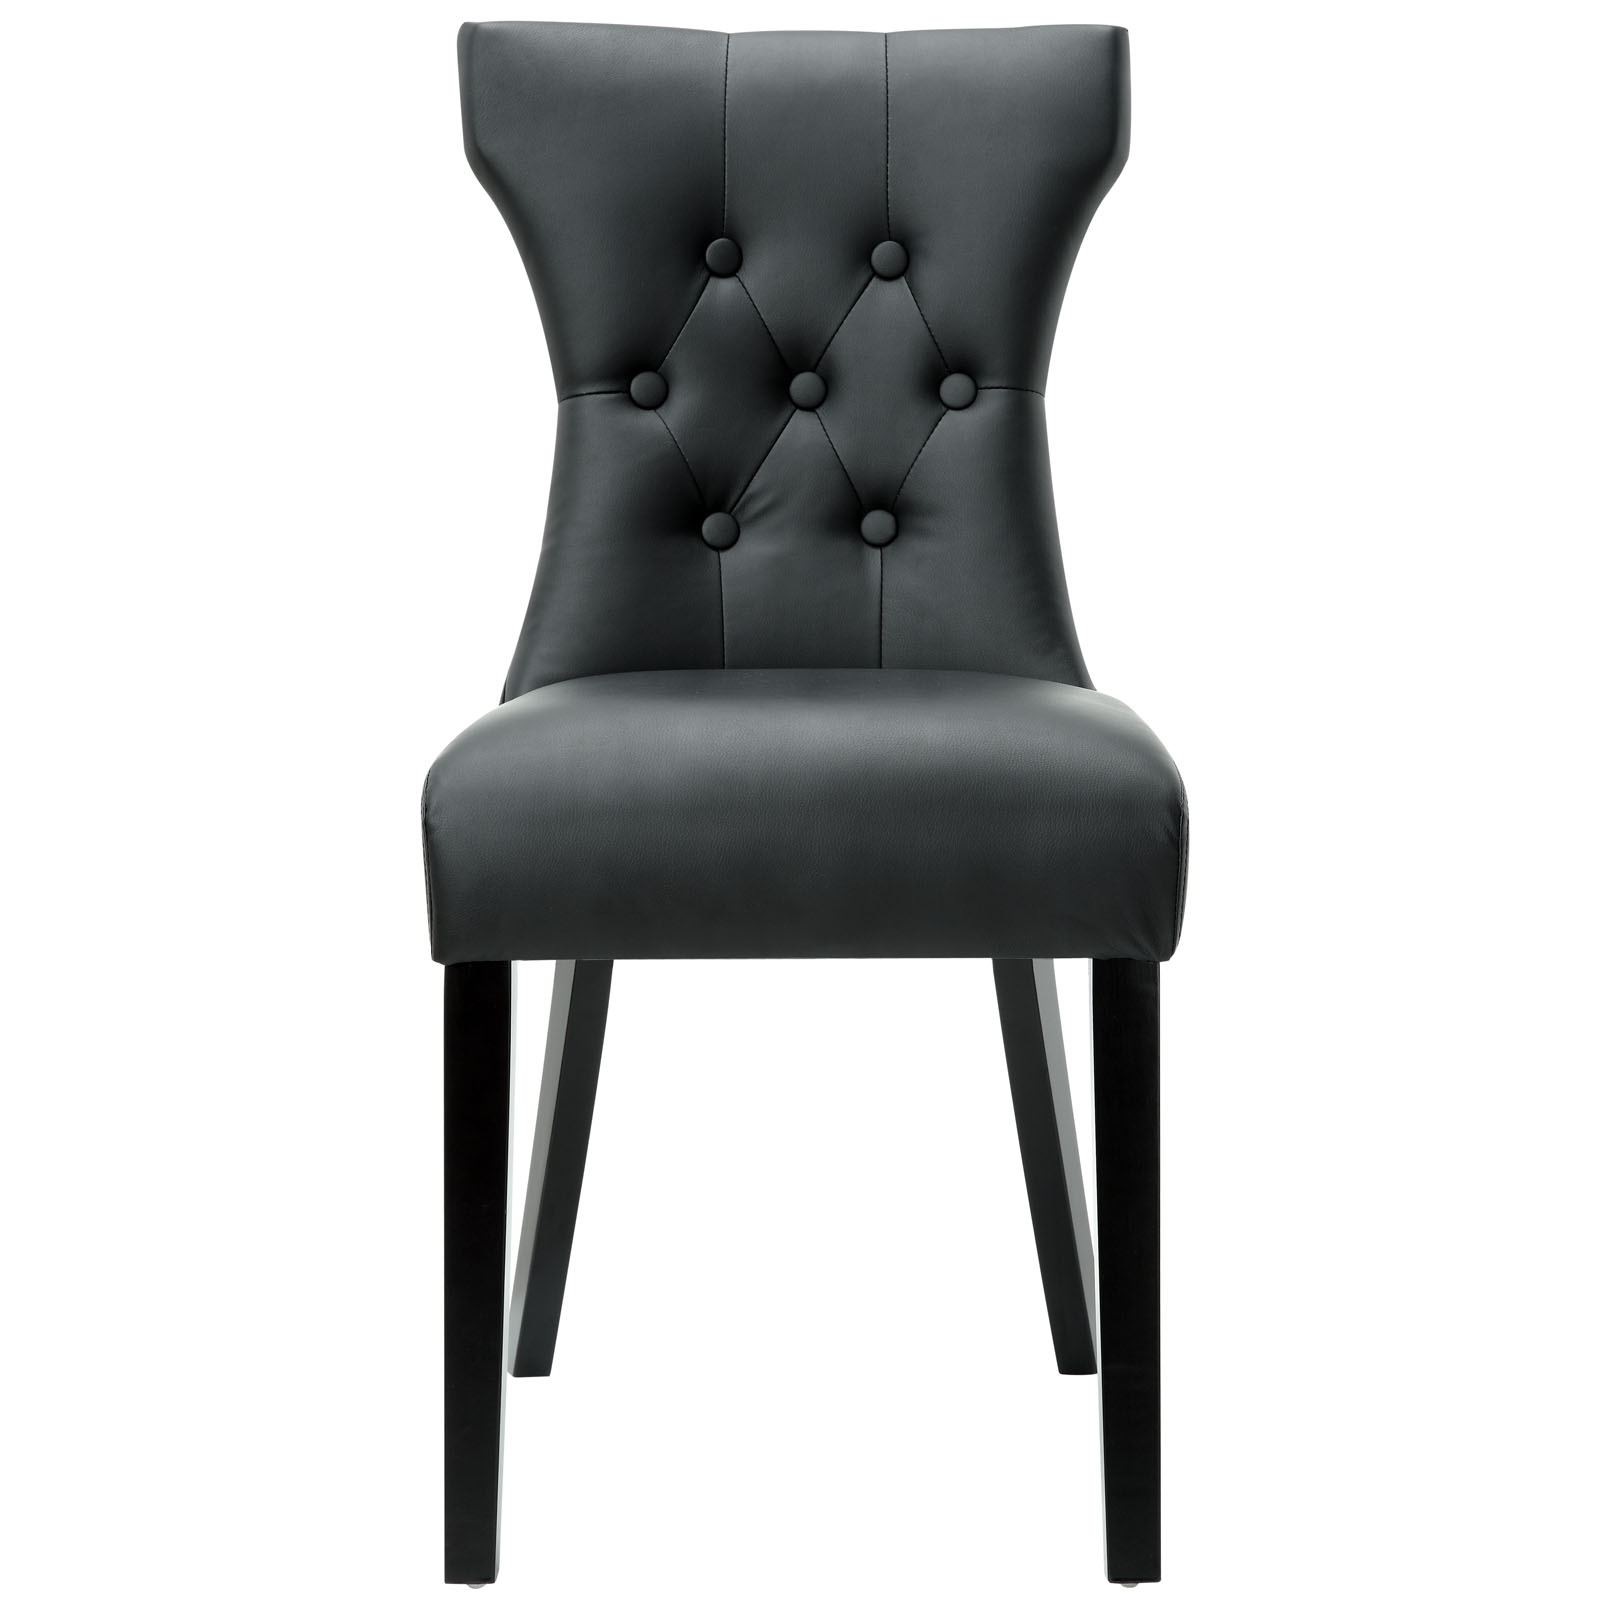 Silhouette Dining Vinyl Side Chair in Black